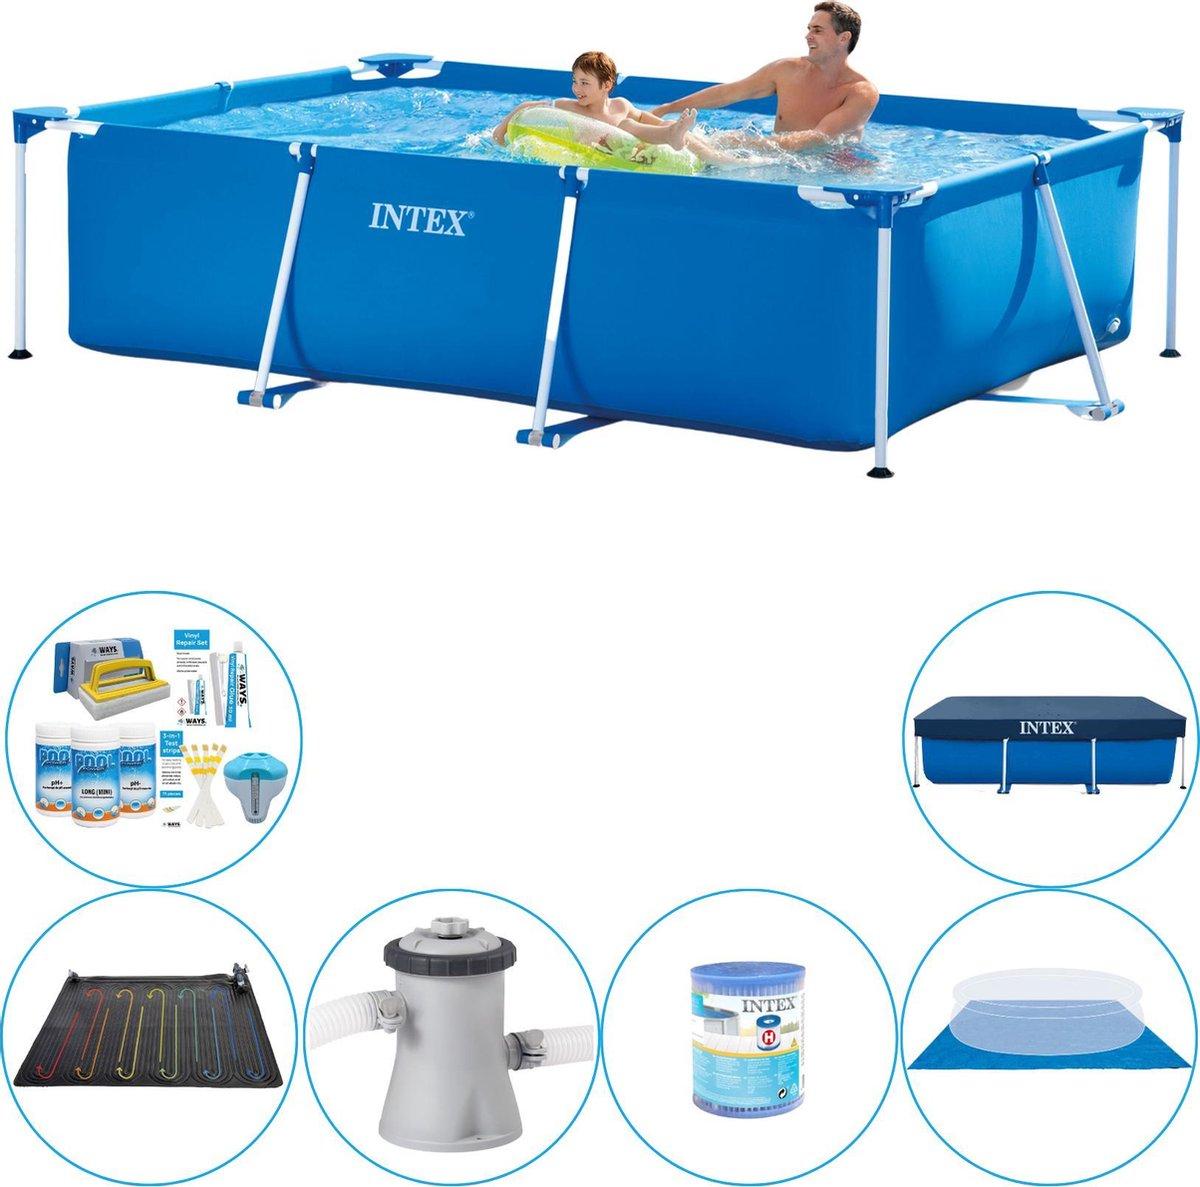 Intex Frame Pool Zwembad Deluxe Deal - 260 x 160 x 65 cm